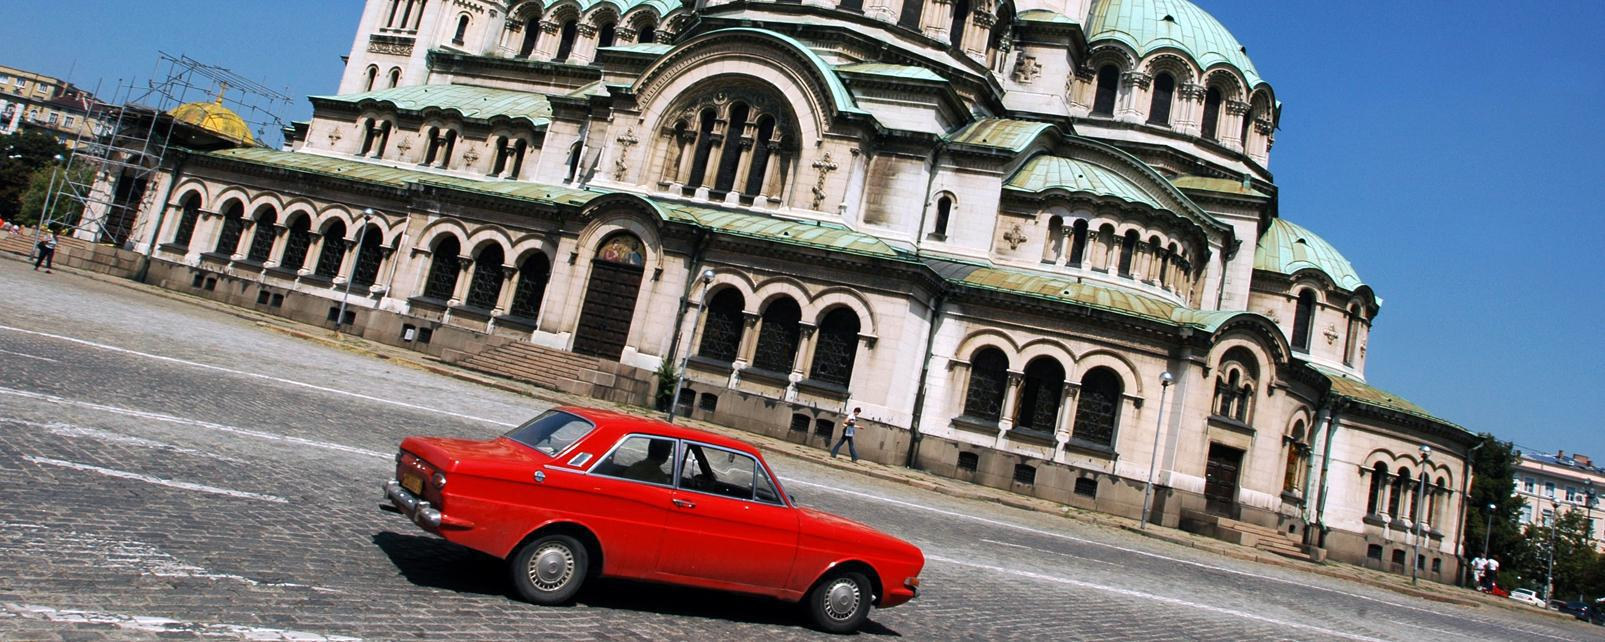 Viajes a bulgaria gu a de viajes bulgaria for Vuelos baratos a bulgaria